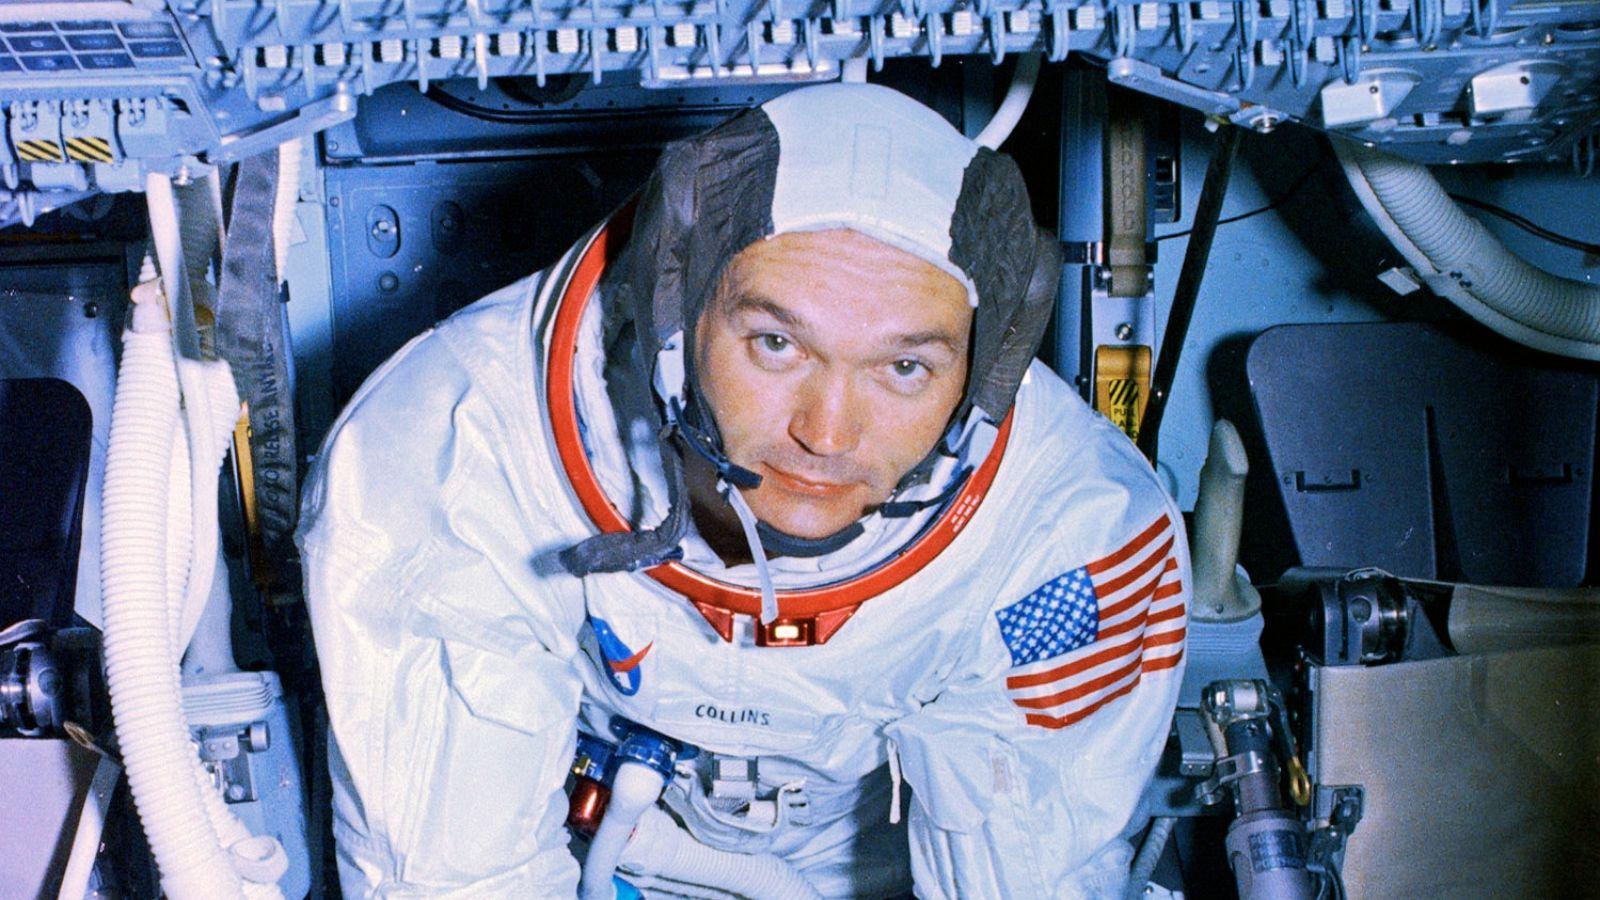 Astronaut Michael Collins, Apollo 11 pilot, dead of cancer - ABC News